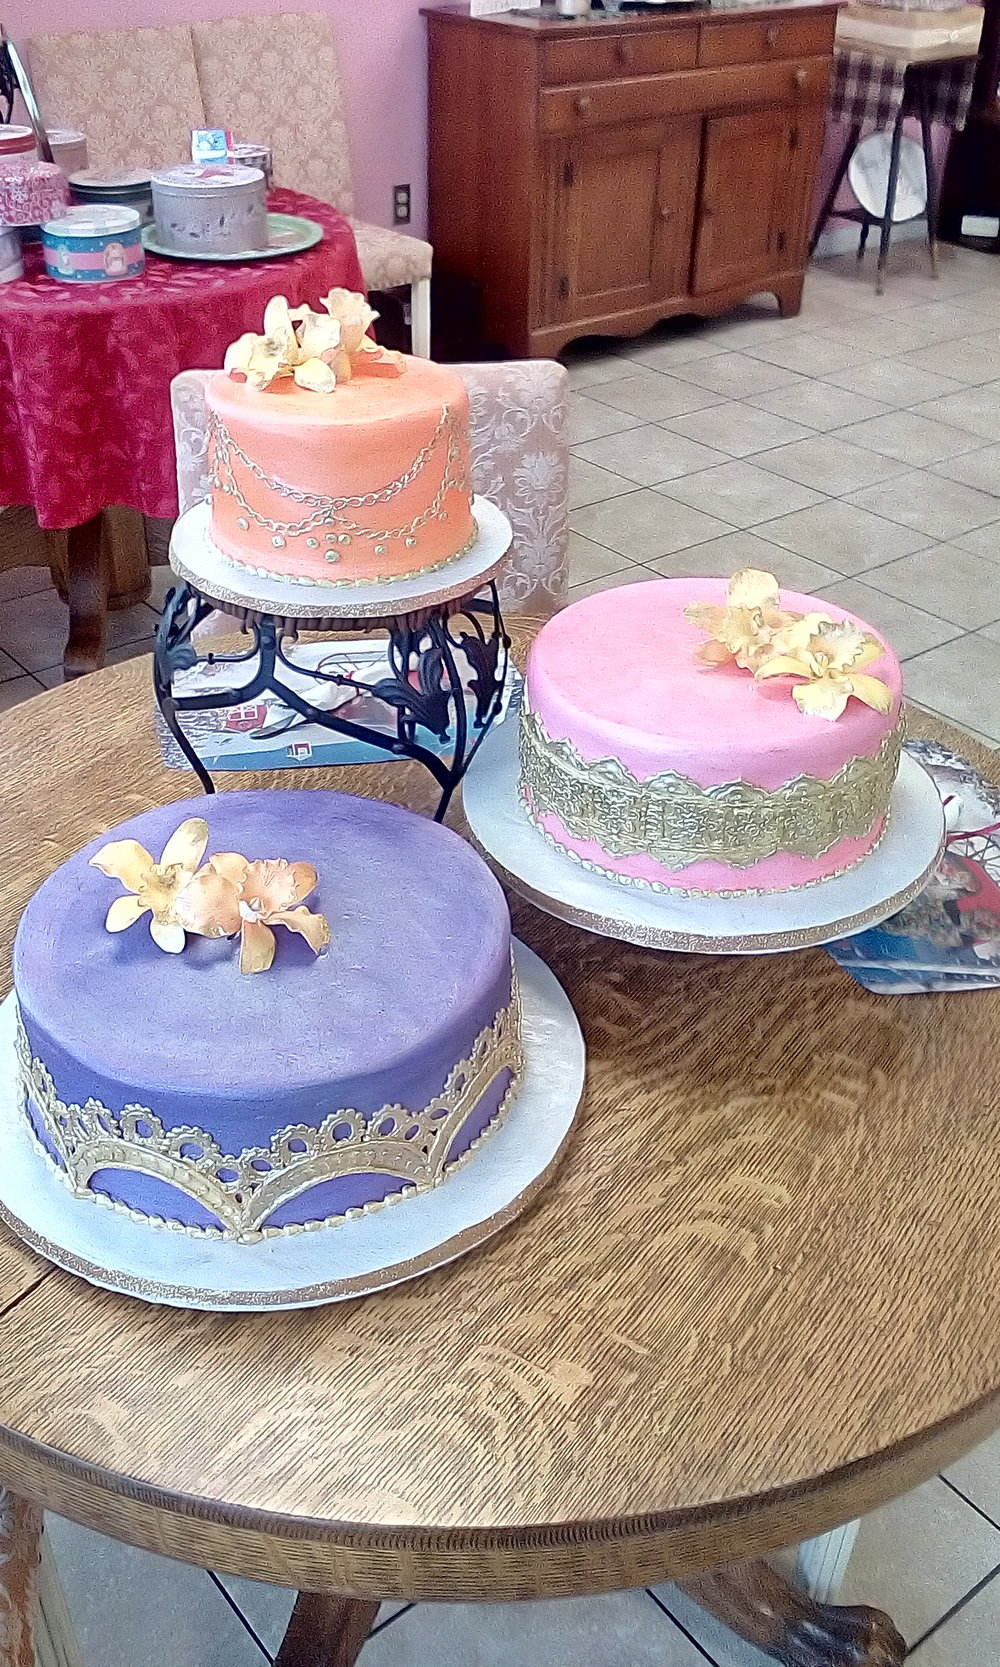 india cakes.jpg